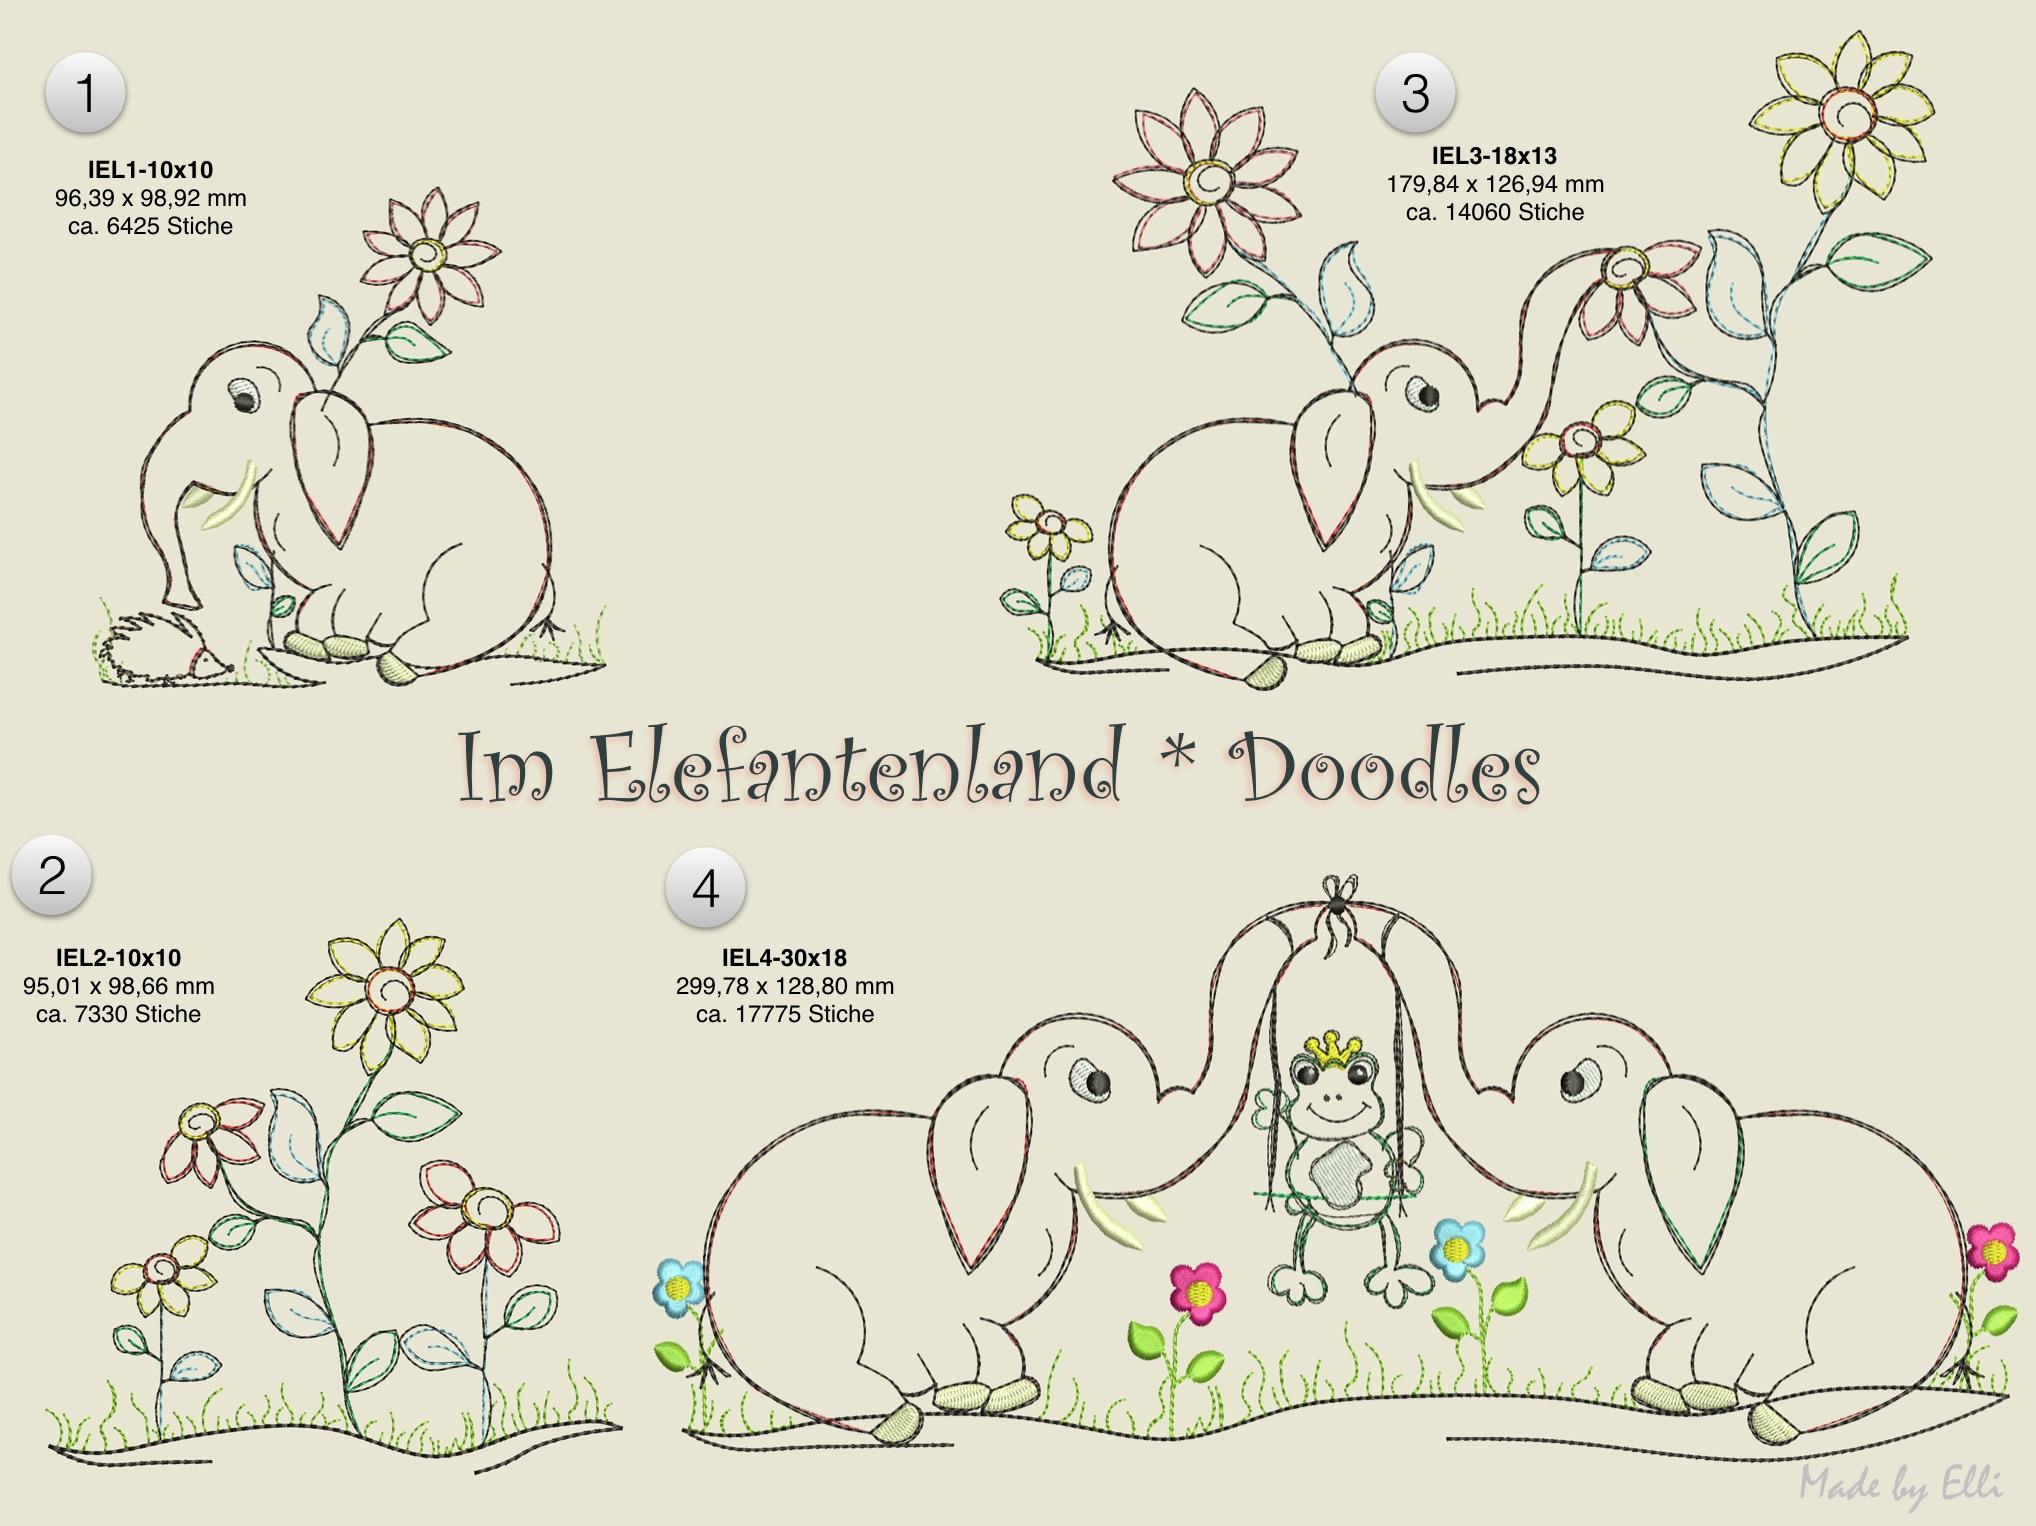 DK-Im Elefantenland